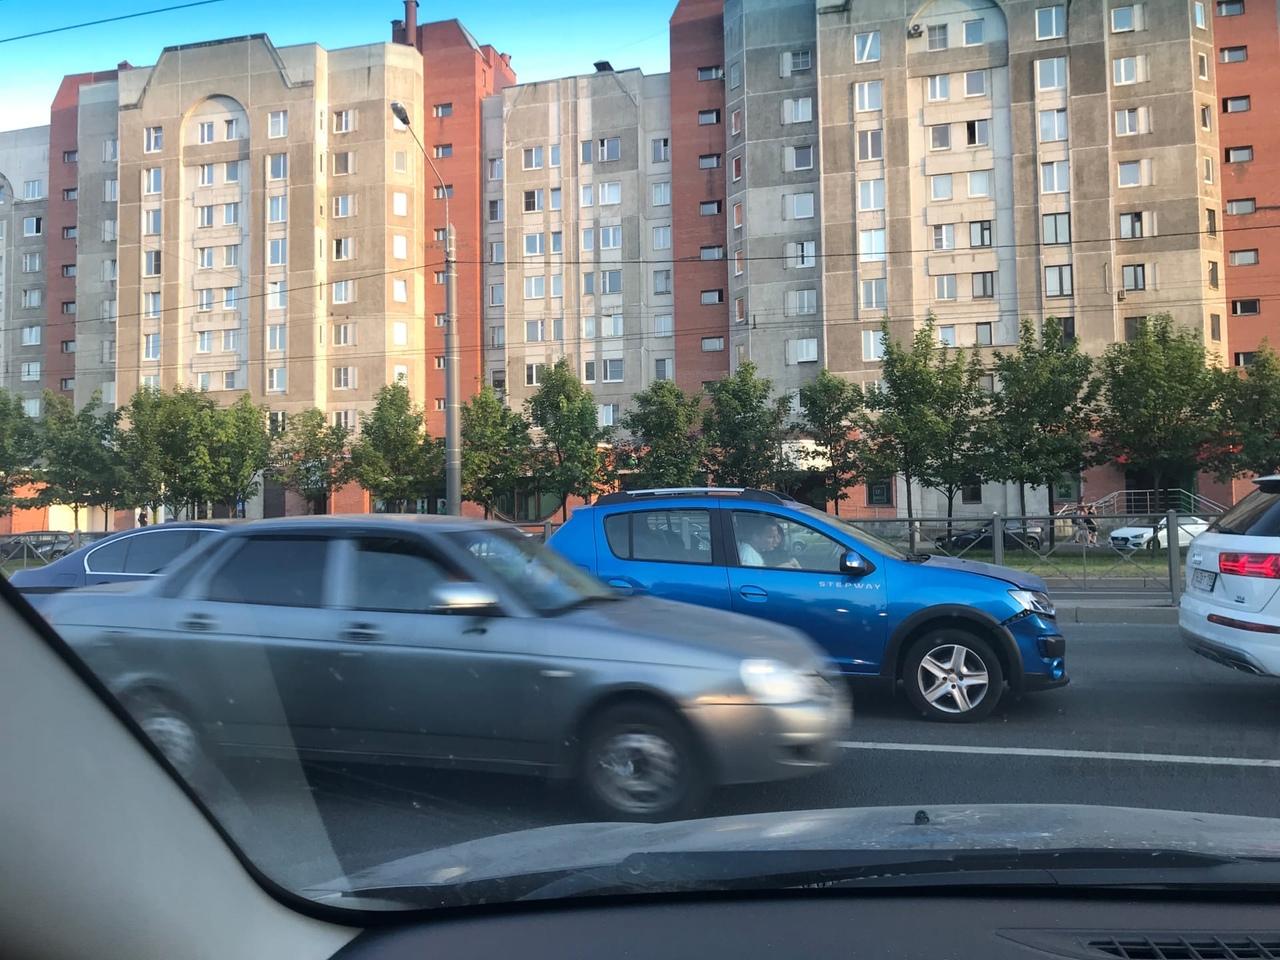 На Ленинском проспекте у дома 94, корпус 1 (магазин Перекрёсток) со счетом 3:2 победил паровозик. За...